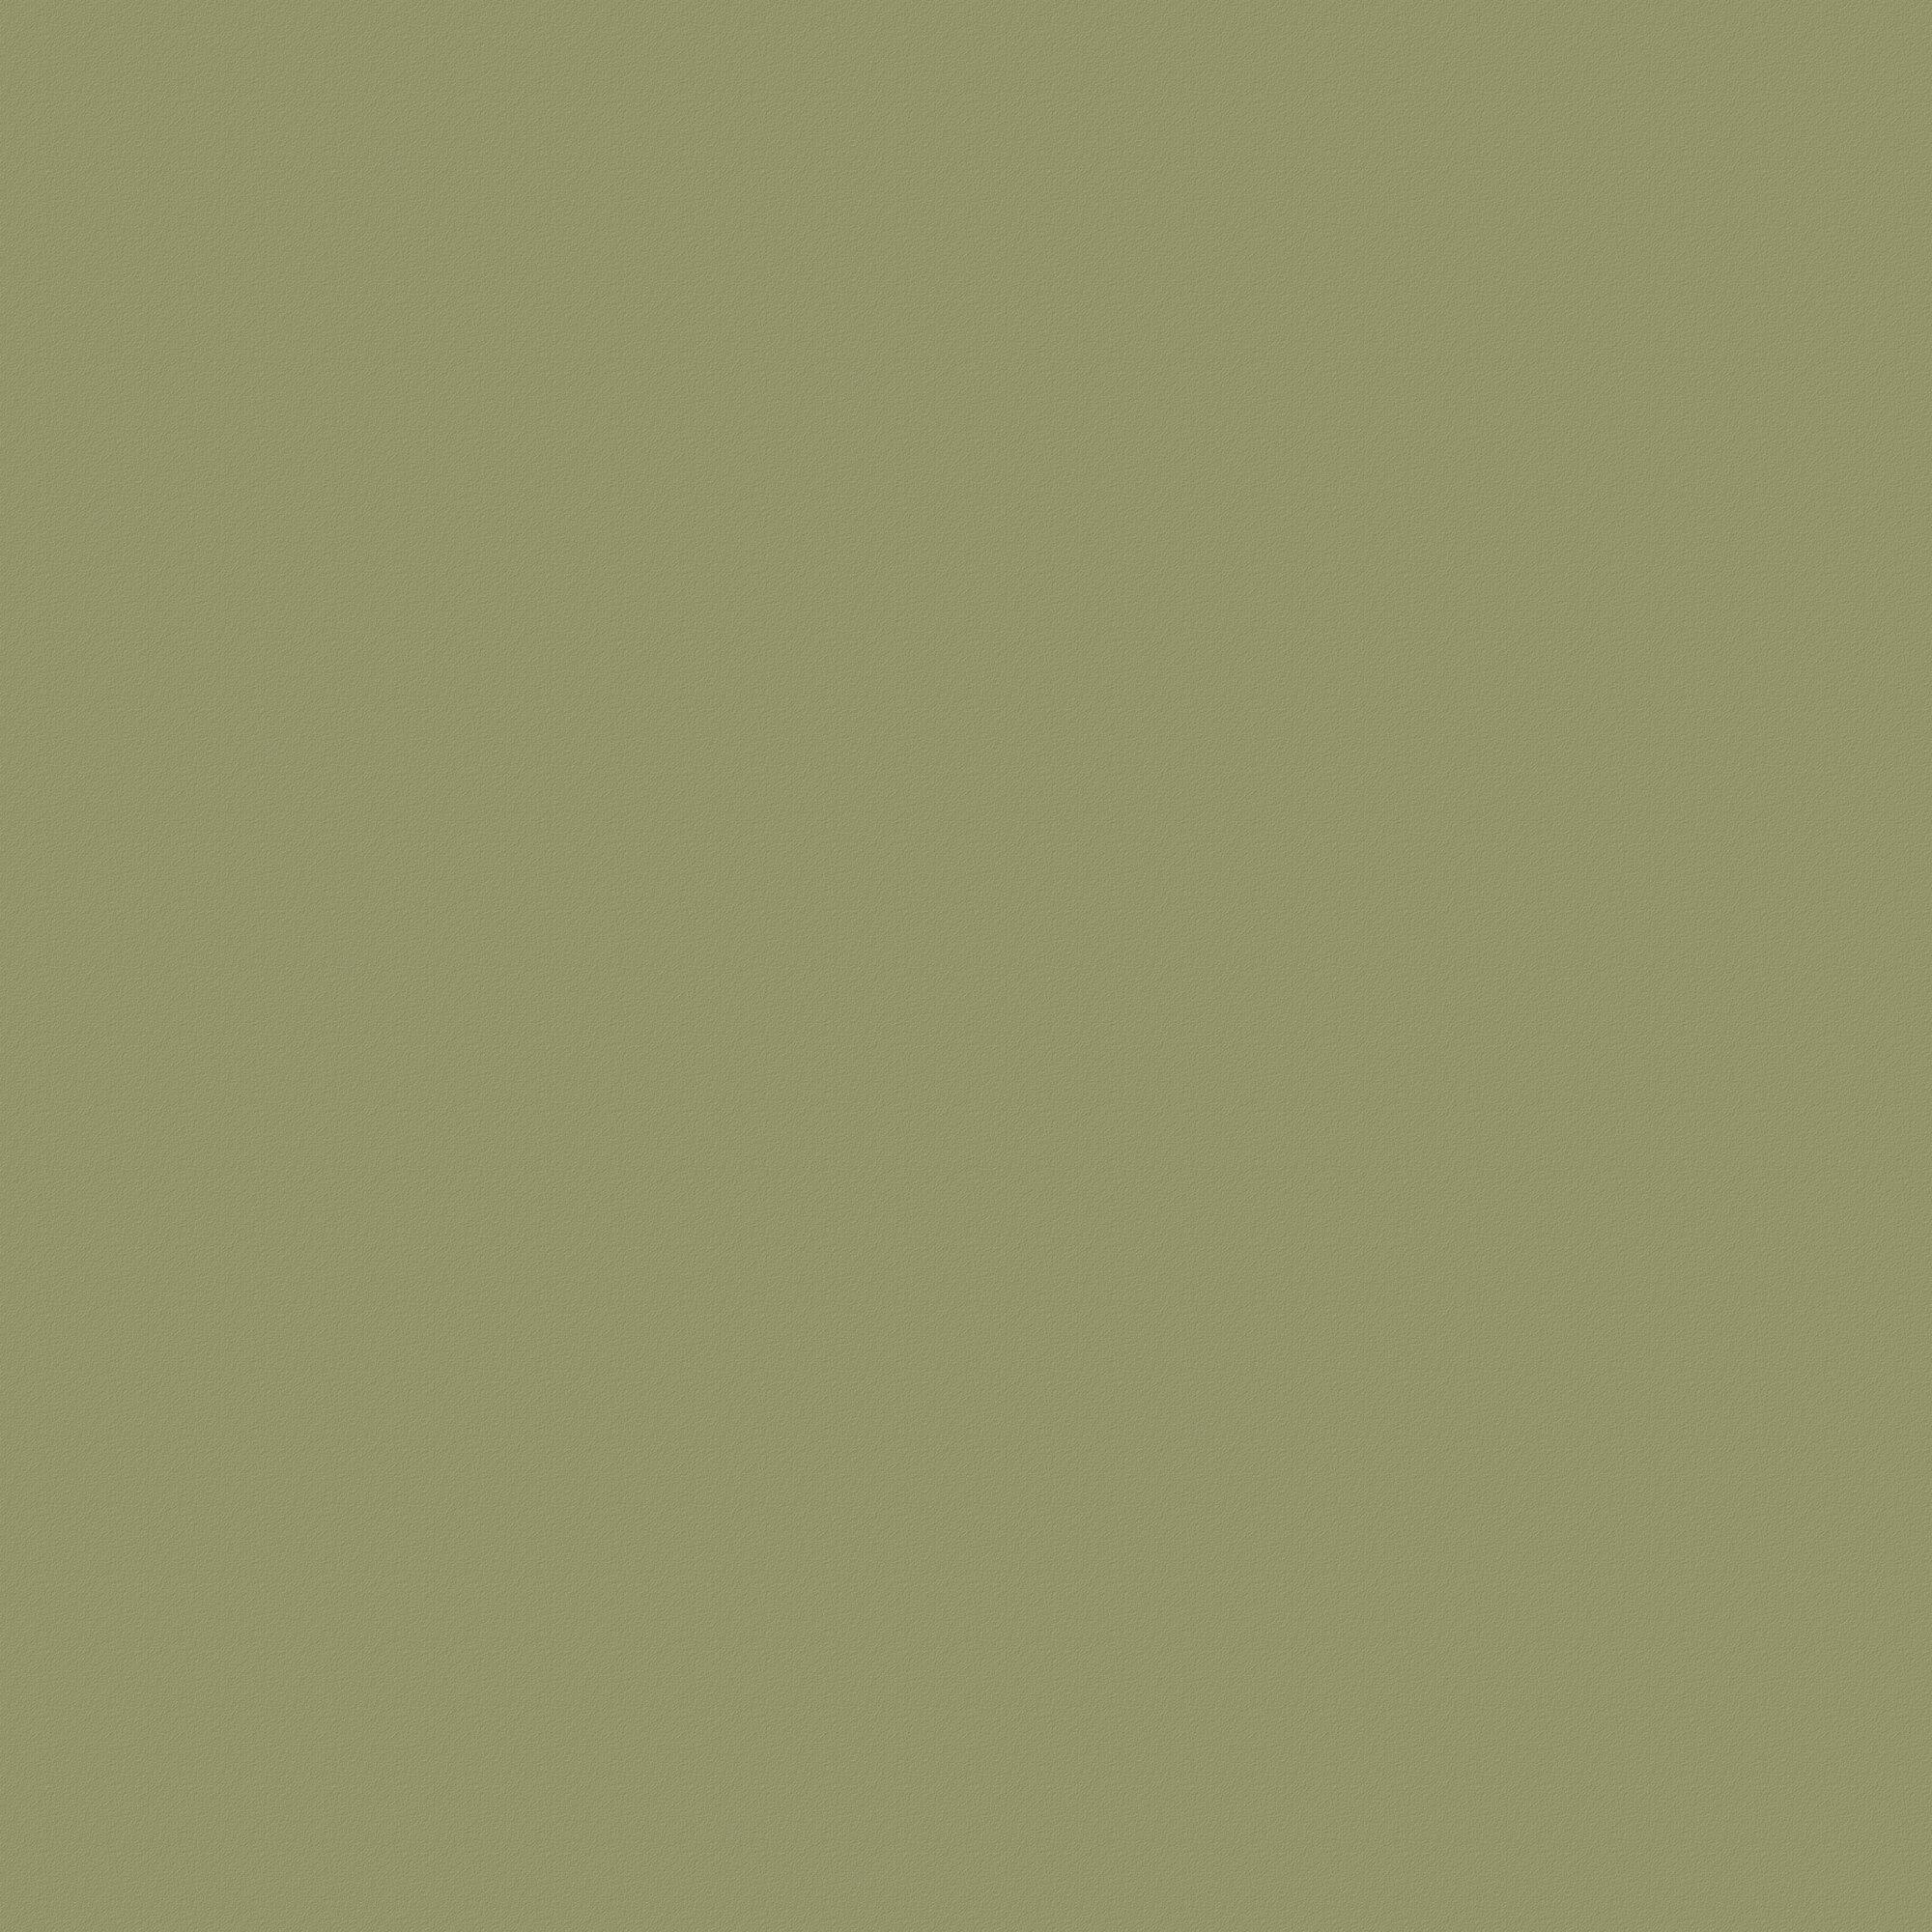 U4439 VL Pistachio Green